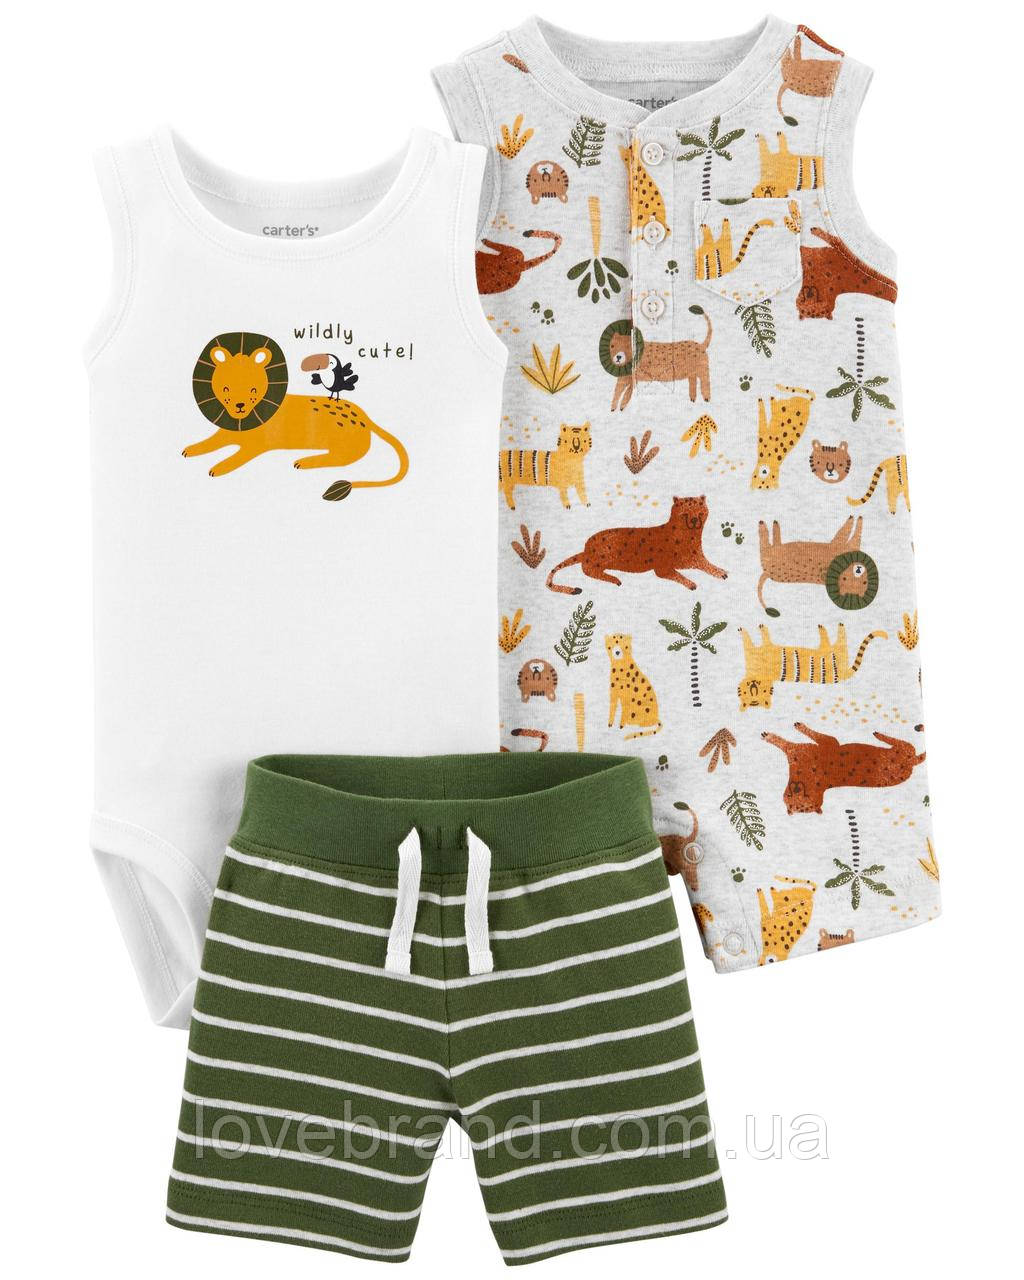 "Летний костюм картерс для малыша ""Леопард"" Carter's"